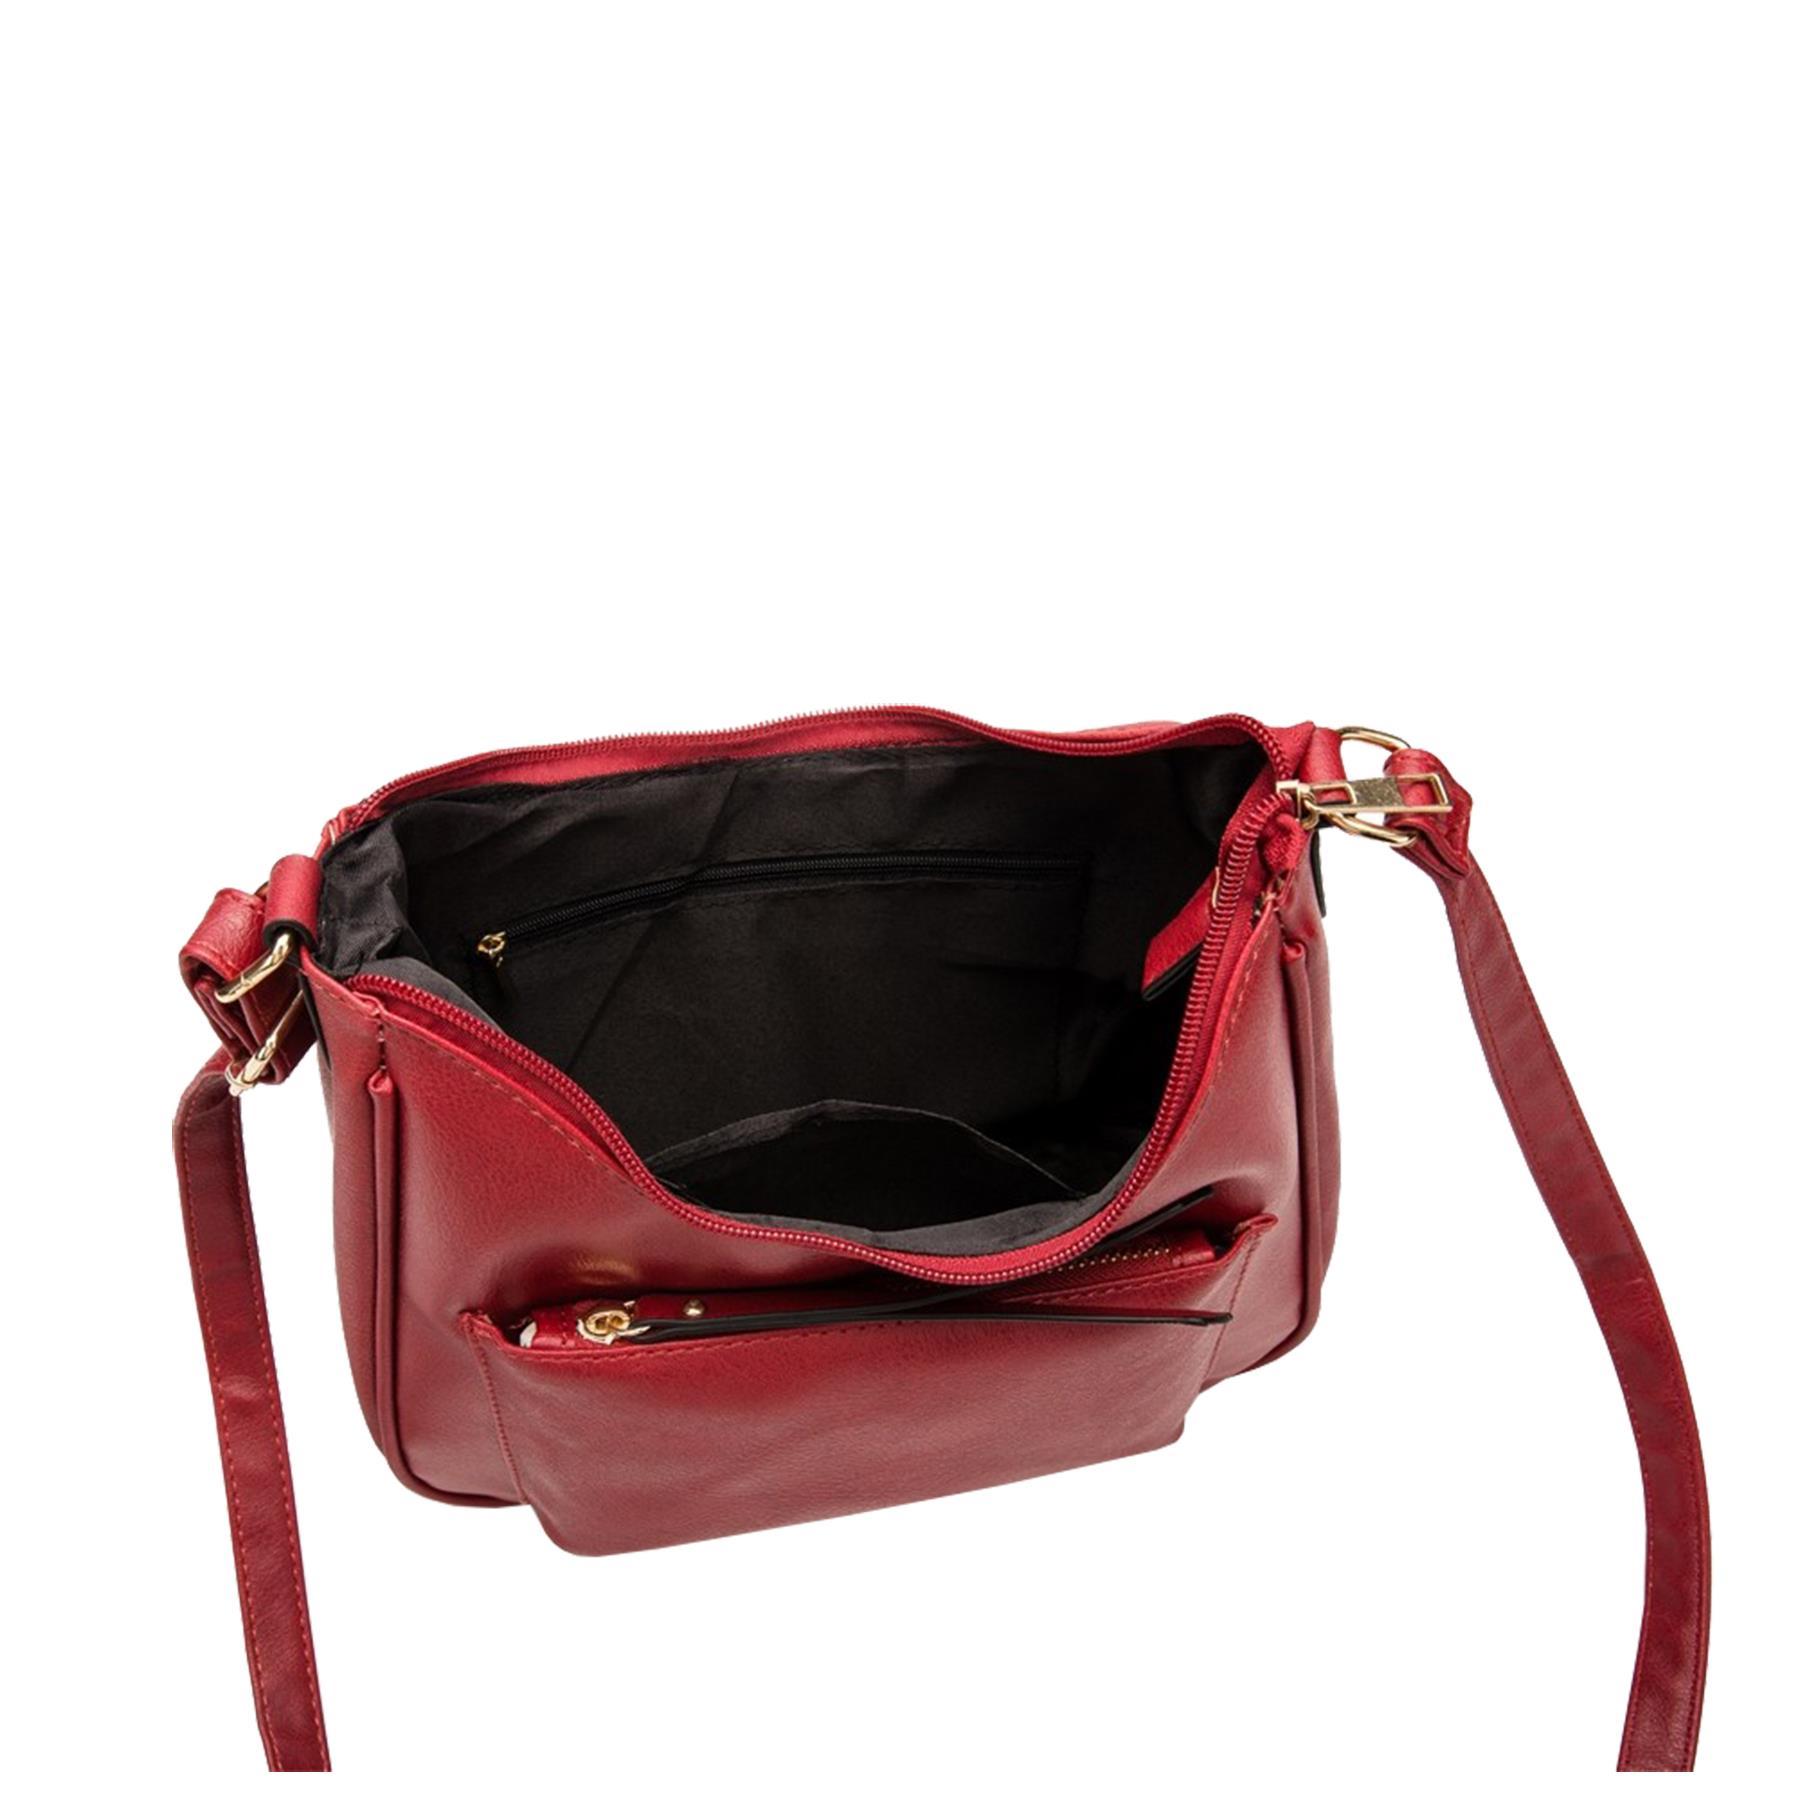 New-Soft-Synthetic-Leather-Front-Pocket-Ladies-Casual-Crossbody-Bag-Handbag thumbnail 4